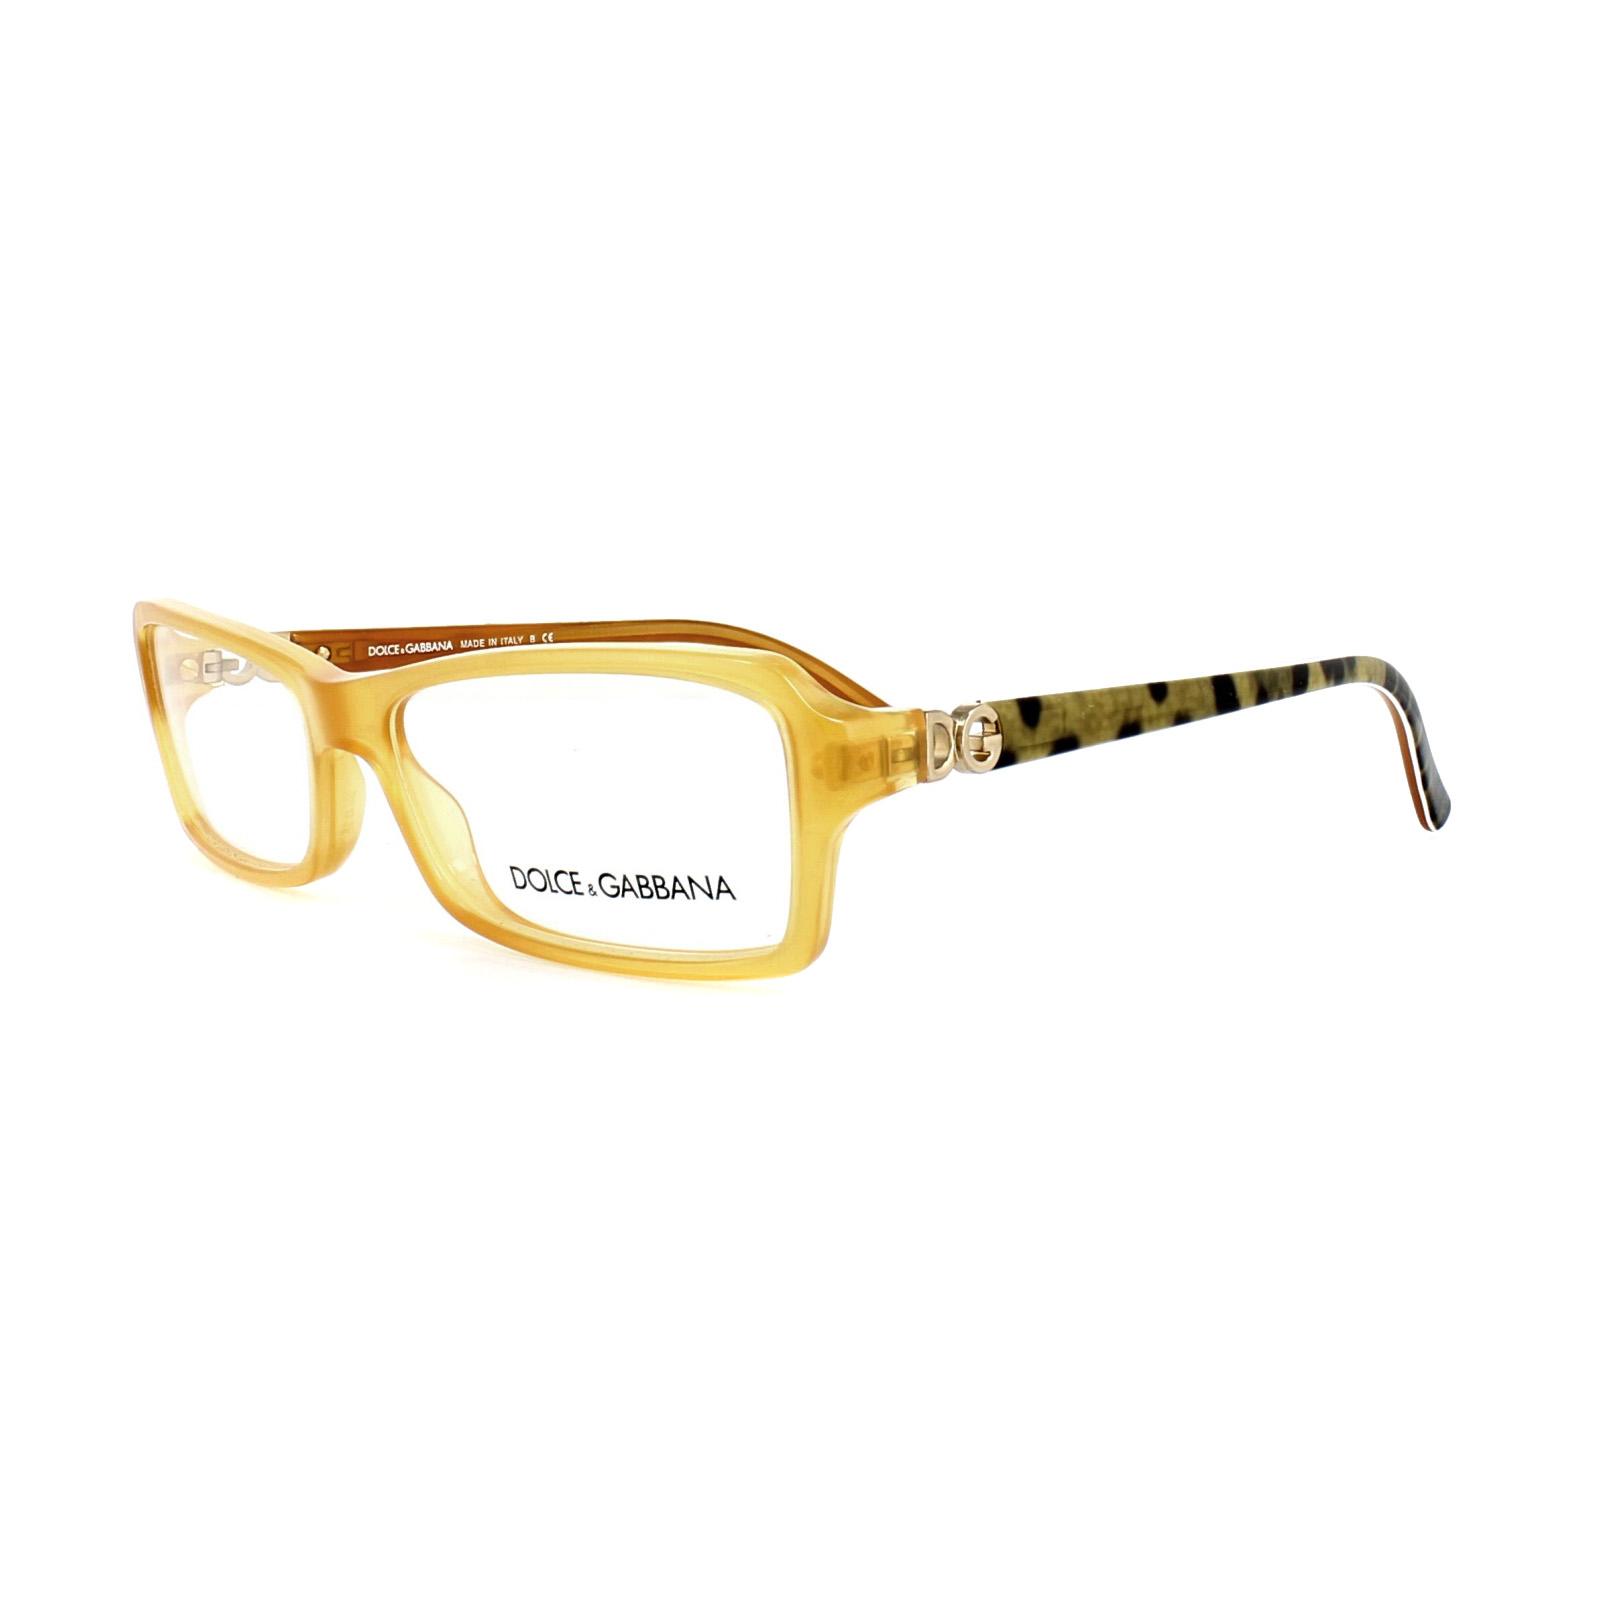 b2a3167632d Sentinel Dolce and Gabbana Glasses Frames DG 3101 1833 Yellow Womens 54mm